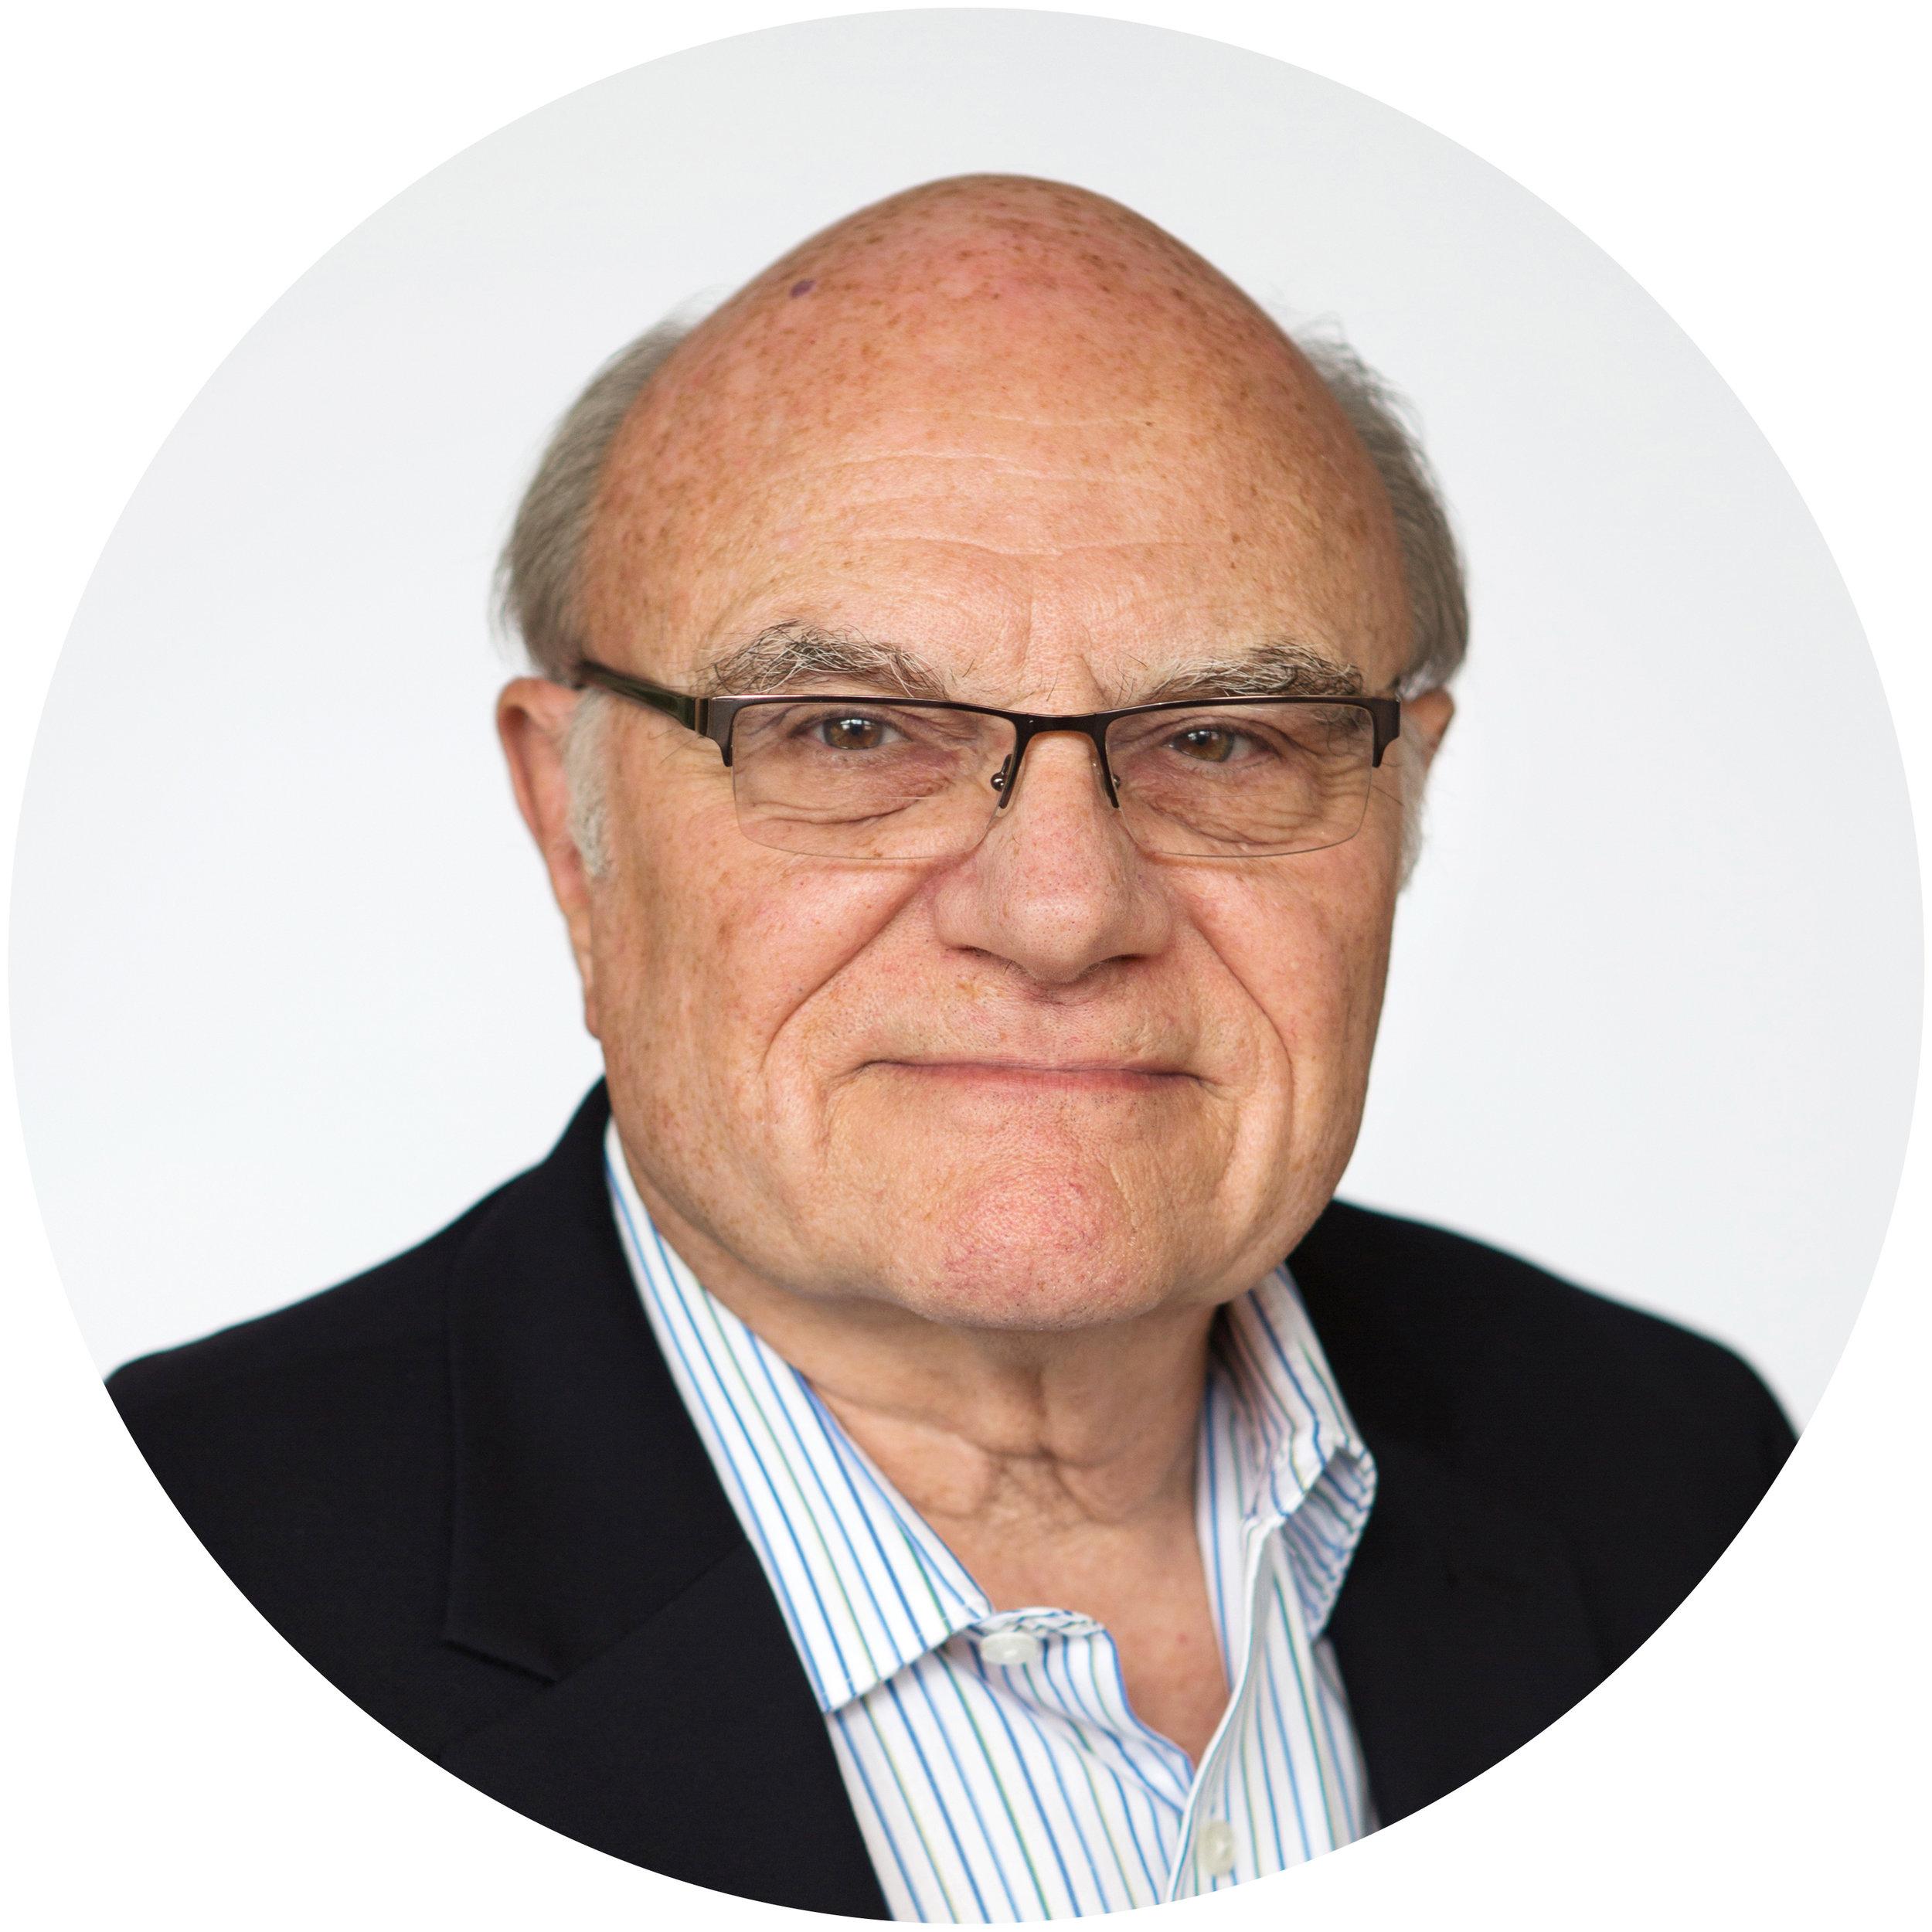 Jim Schifo, P.E., Vice President, Industrial Services, KERAMIDA Inc.